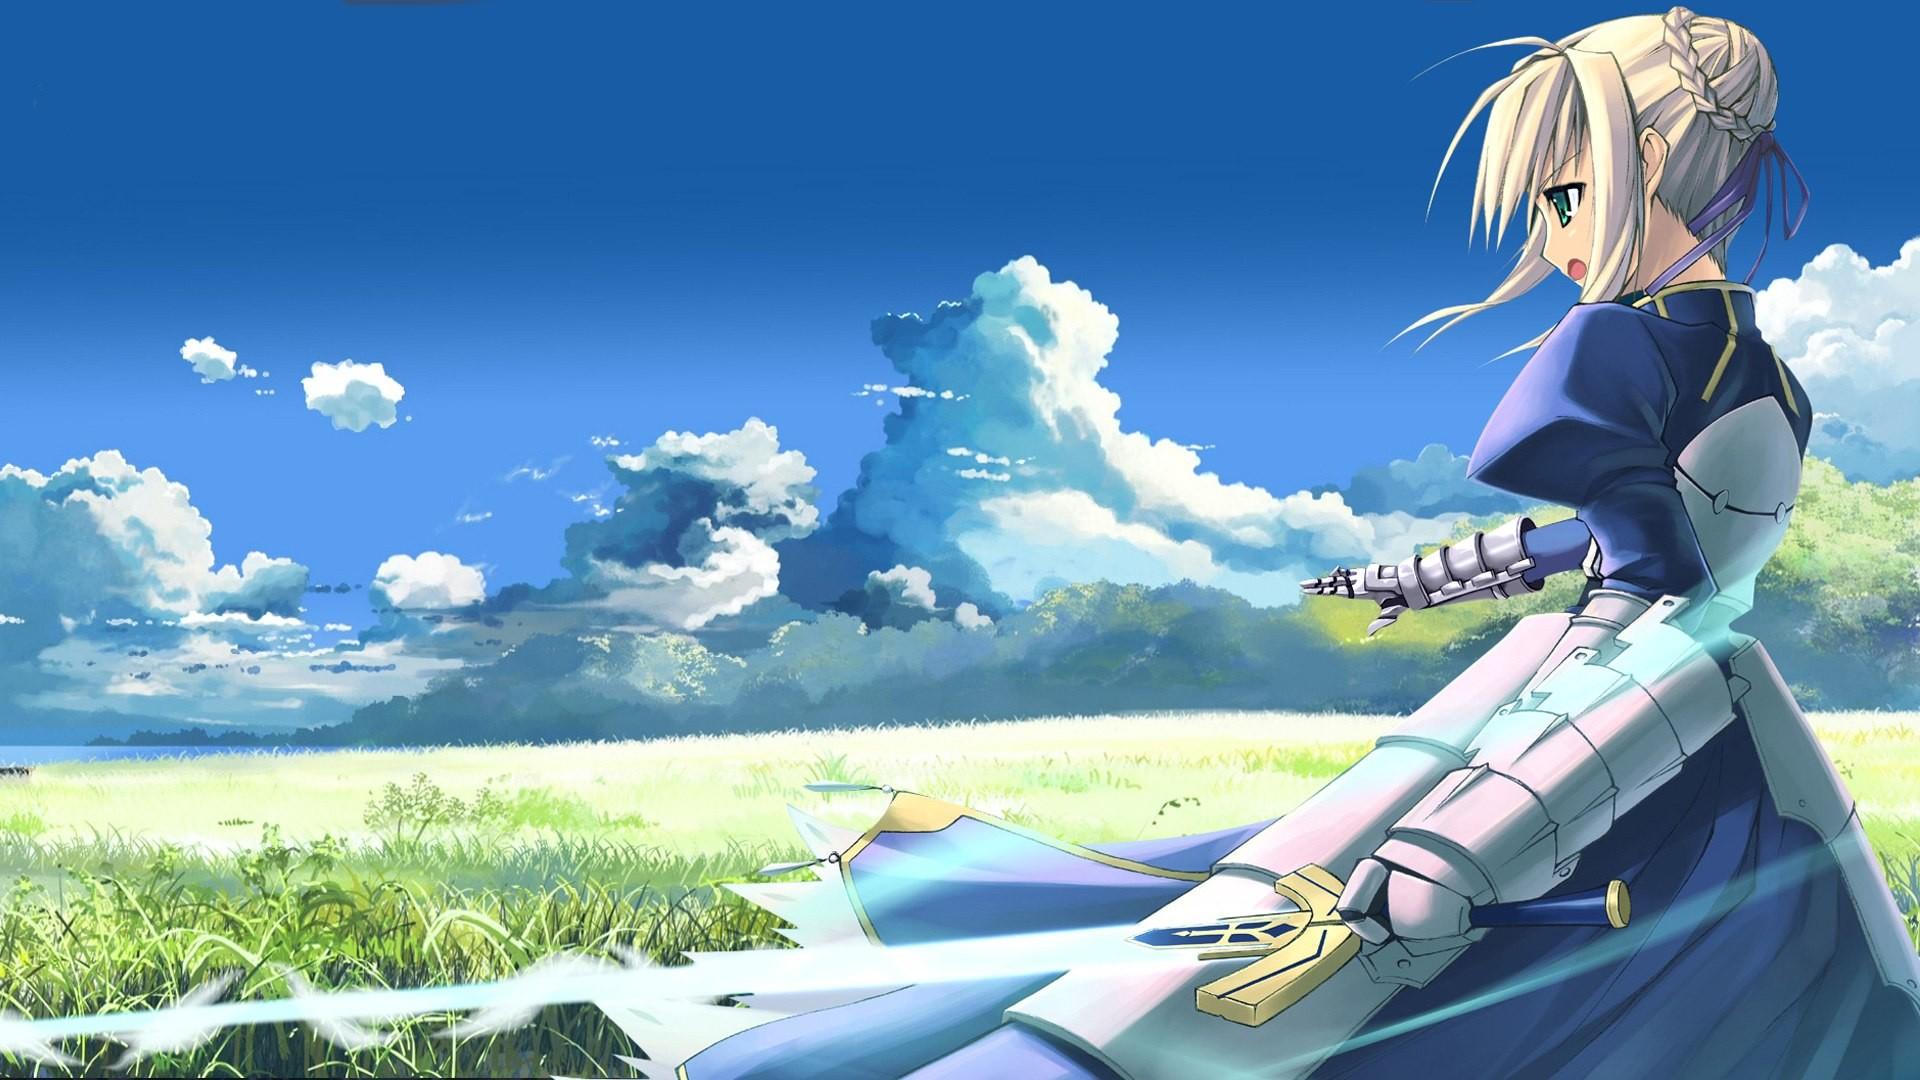 Anime Backgrounds. 1920×1080. Anime Boy Wallpaper